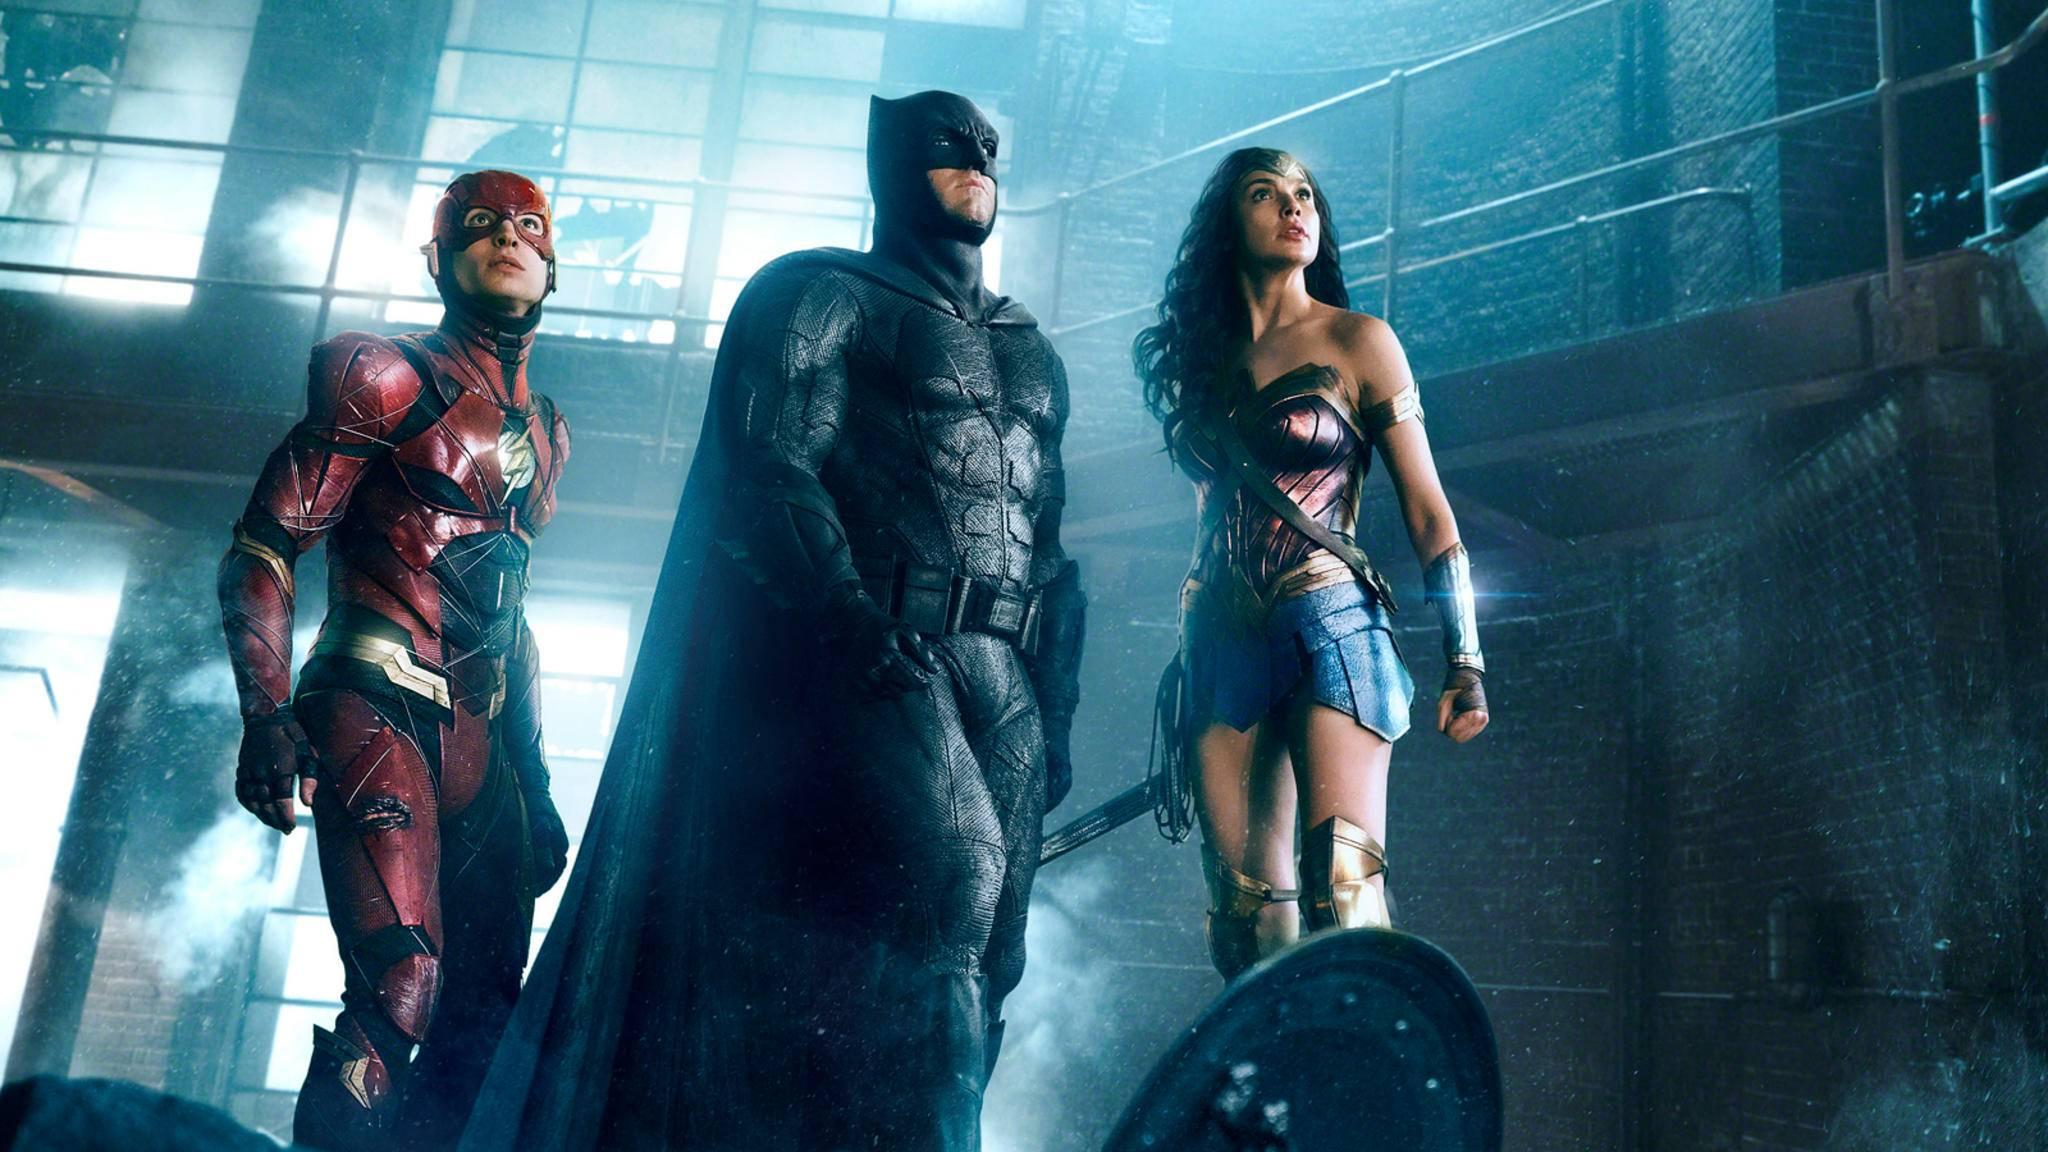 Warner Bros. Entertainment Inc. 2017